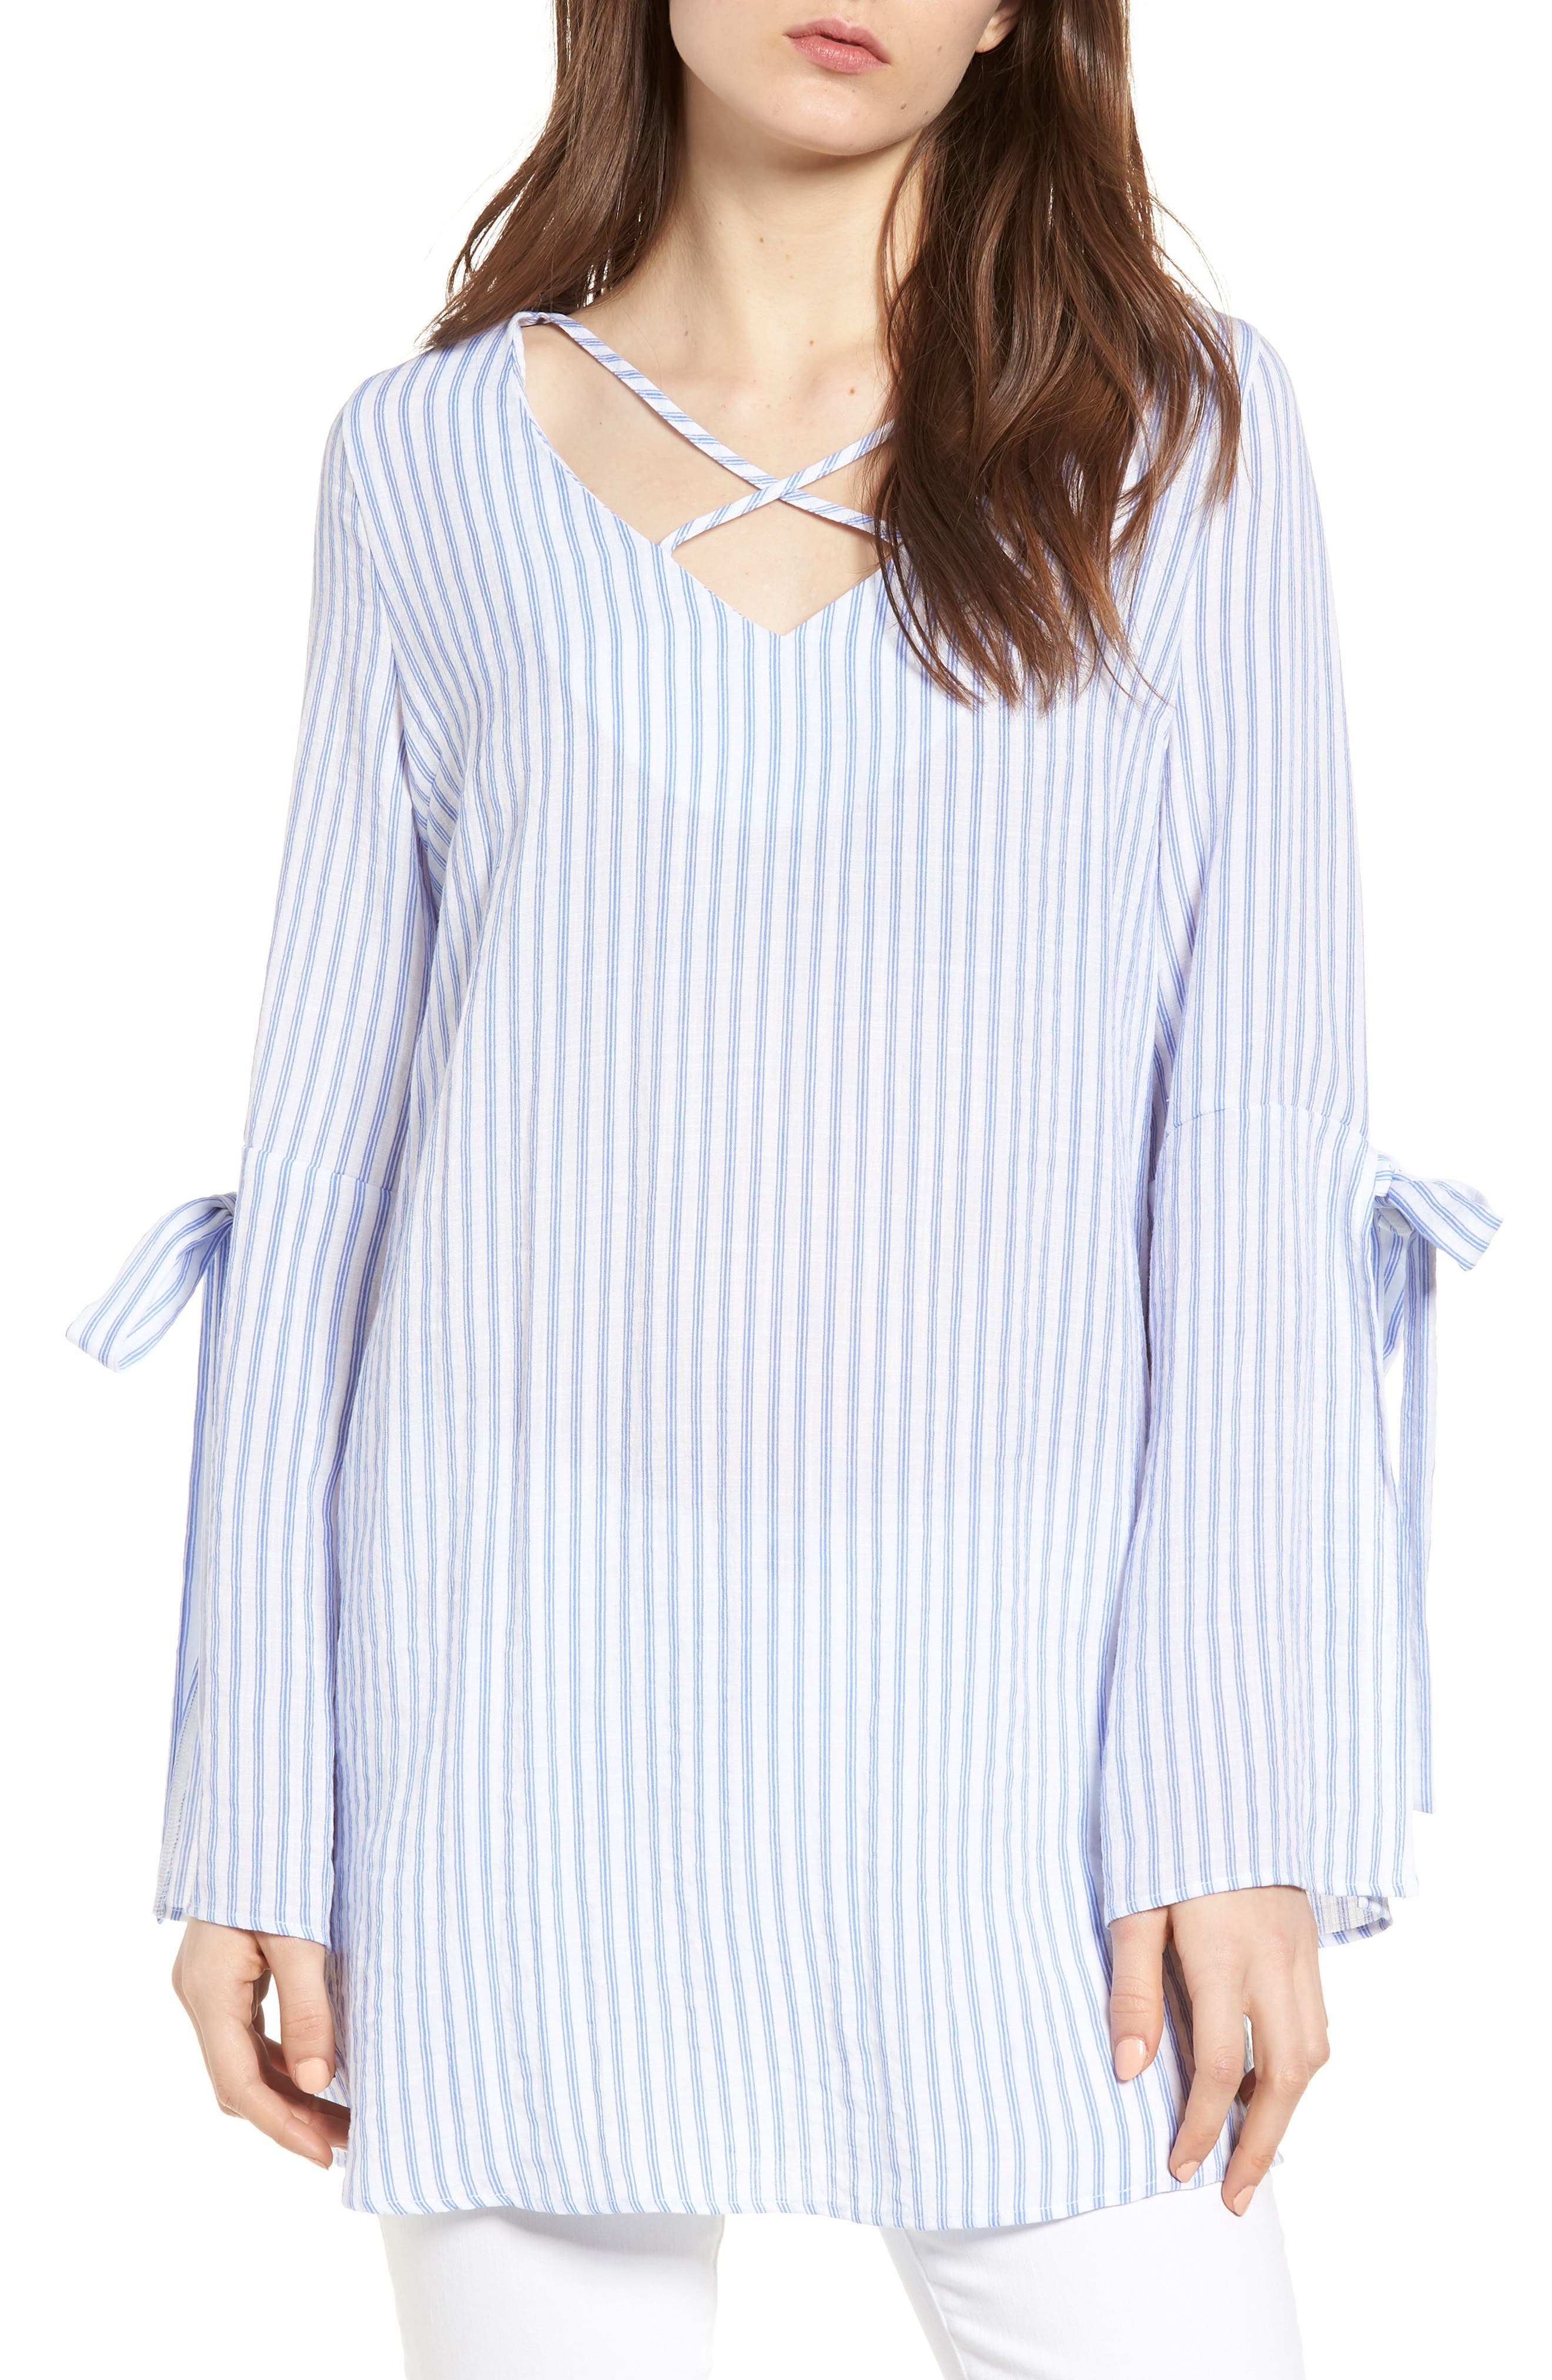 Bishop + Young Stripe Tunic Top,                         Main,                         color, Blue White Stripe